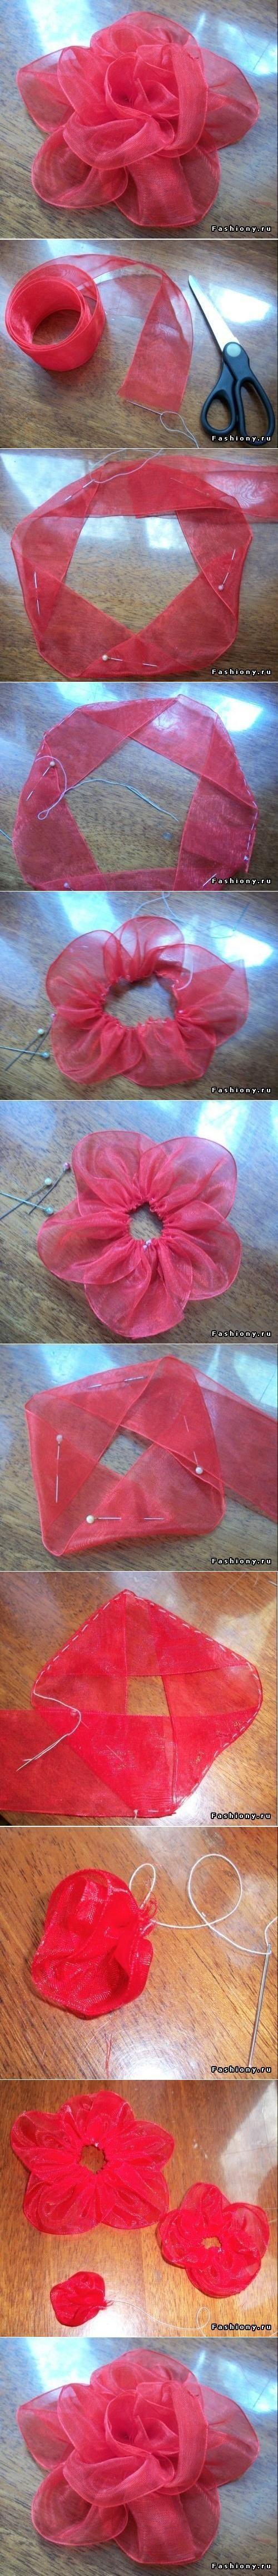 DIY Ribbon Tape Flower DIY Projects | UsefulDIY.com: